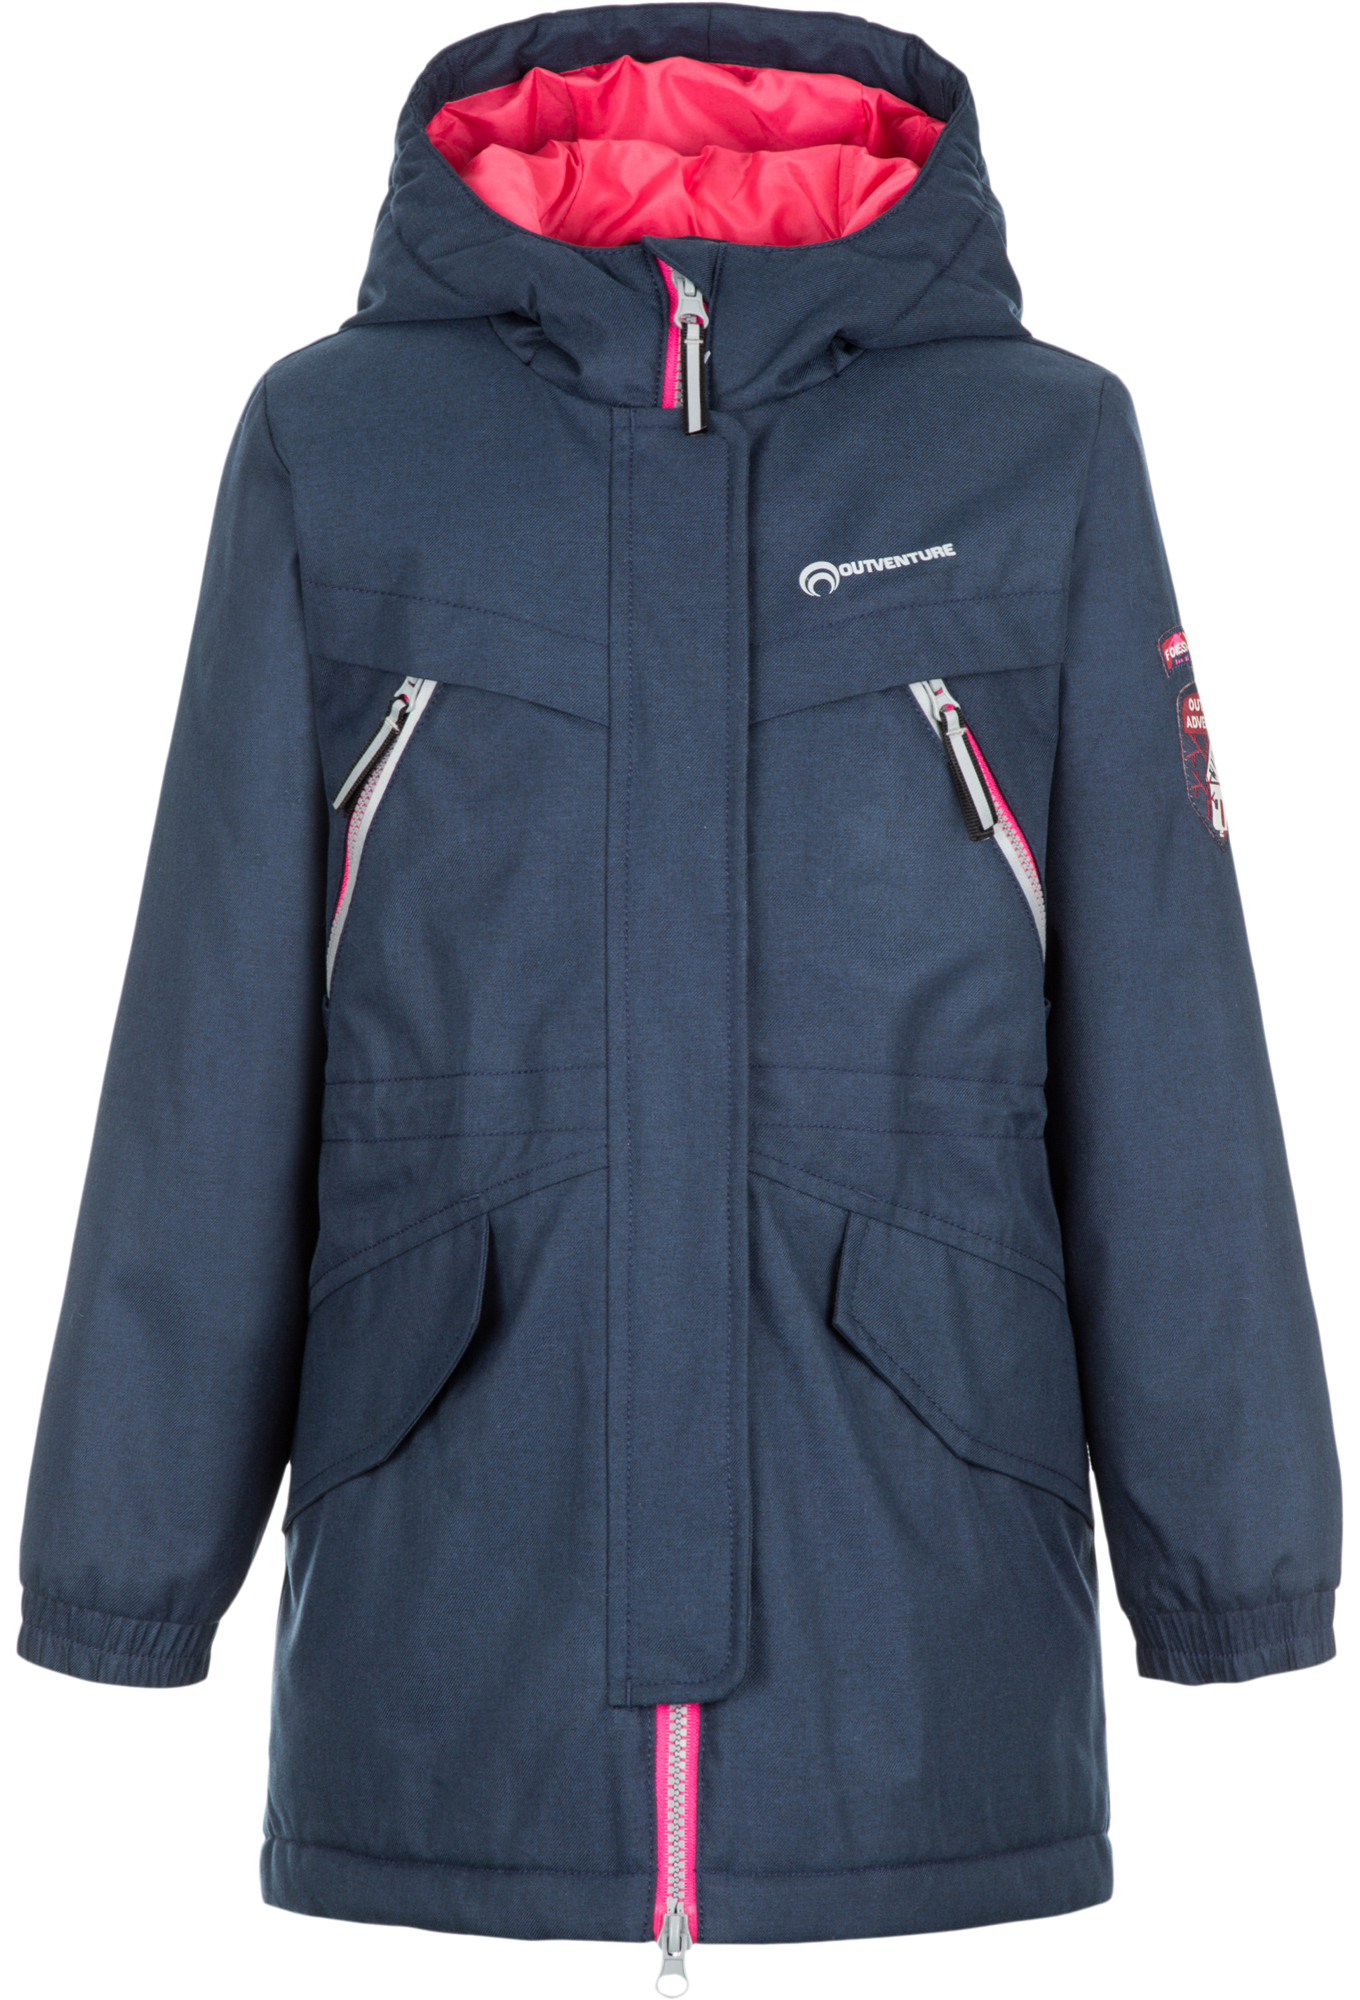 Outventure Куртка утепленная для девочек Outventure, размер 110